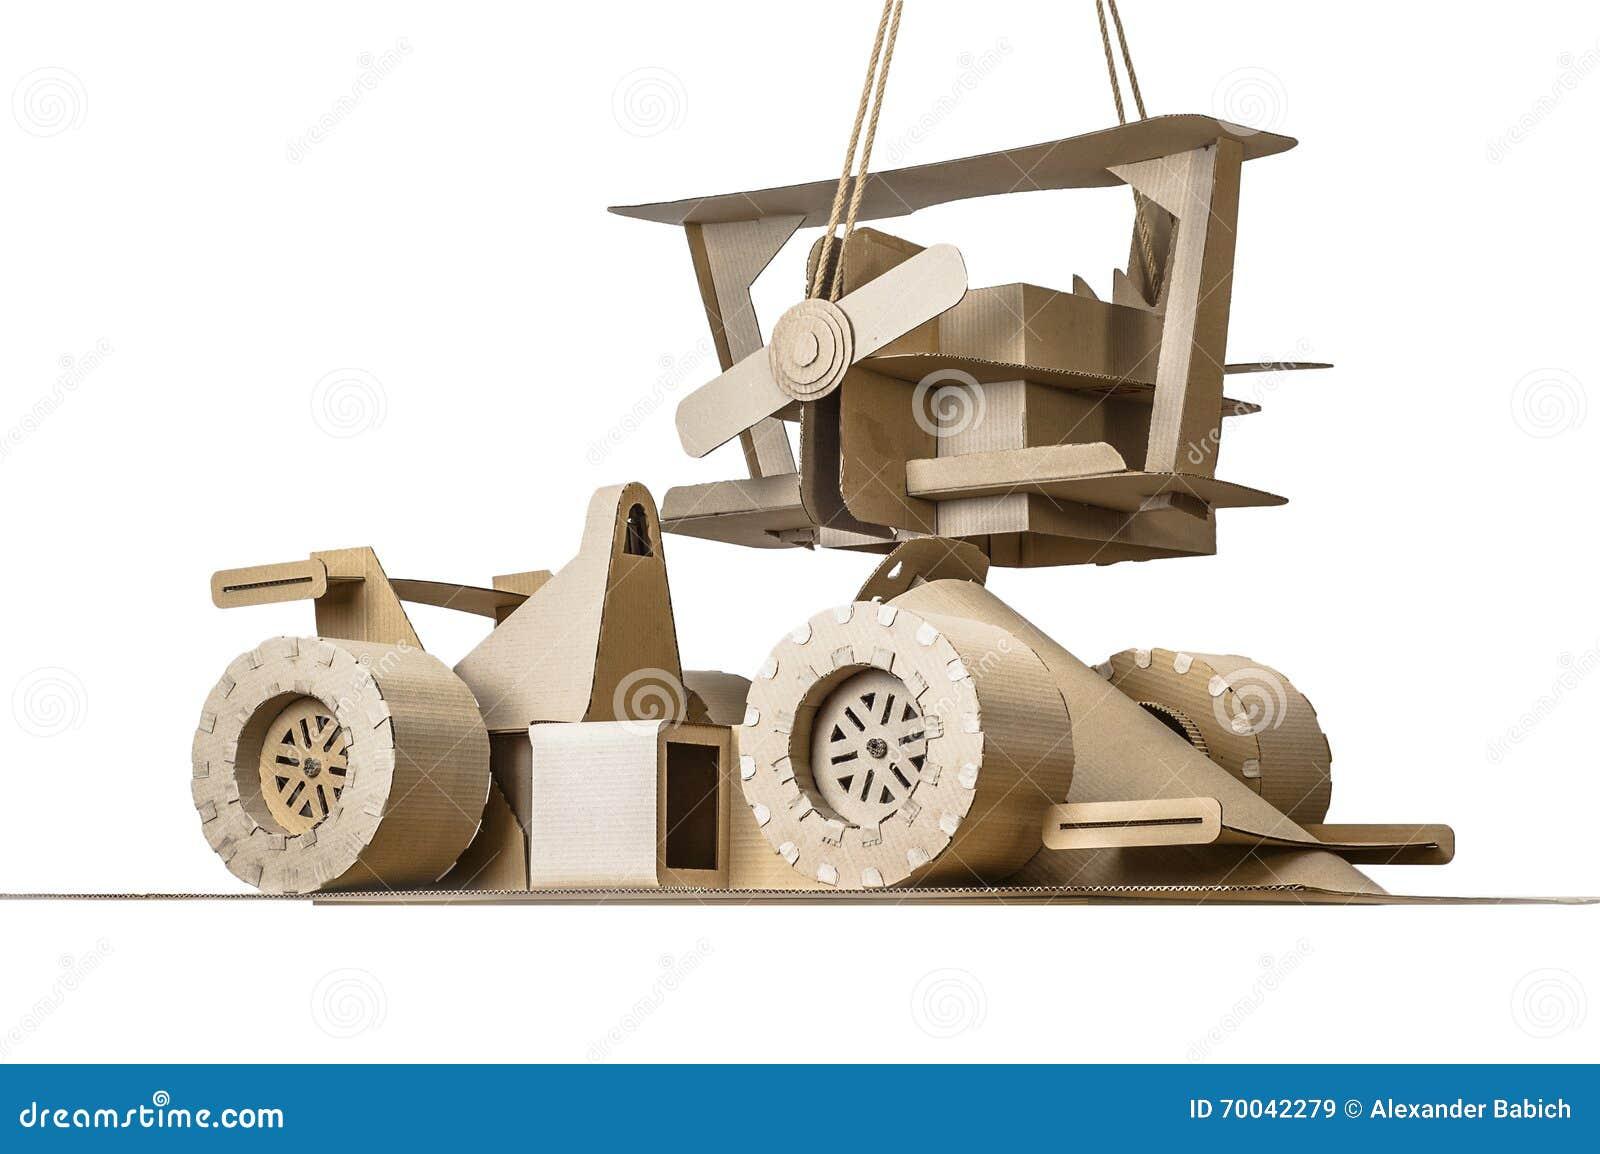 Cardboard Racing Car And Cardboard Plane Stock Image - Image